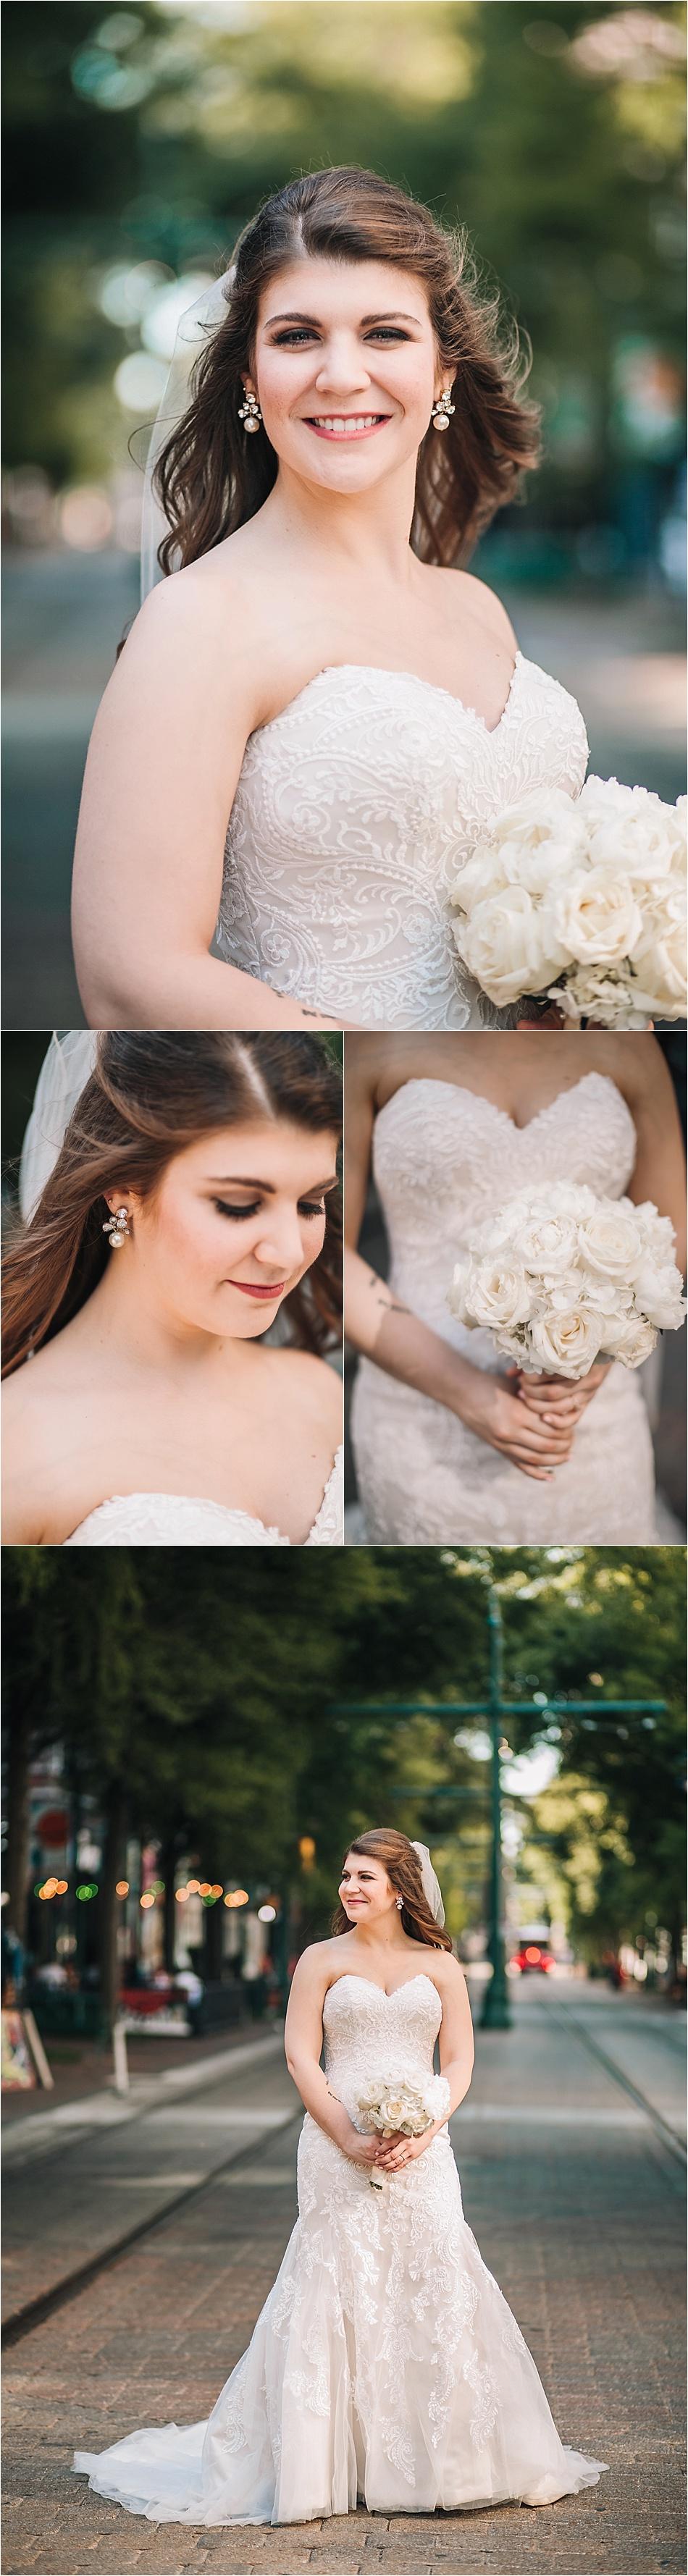 CK-Photo-Nashville-Wedding-Photographer-_0018.jpg